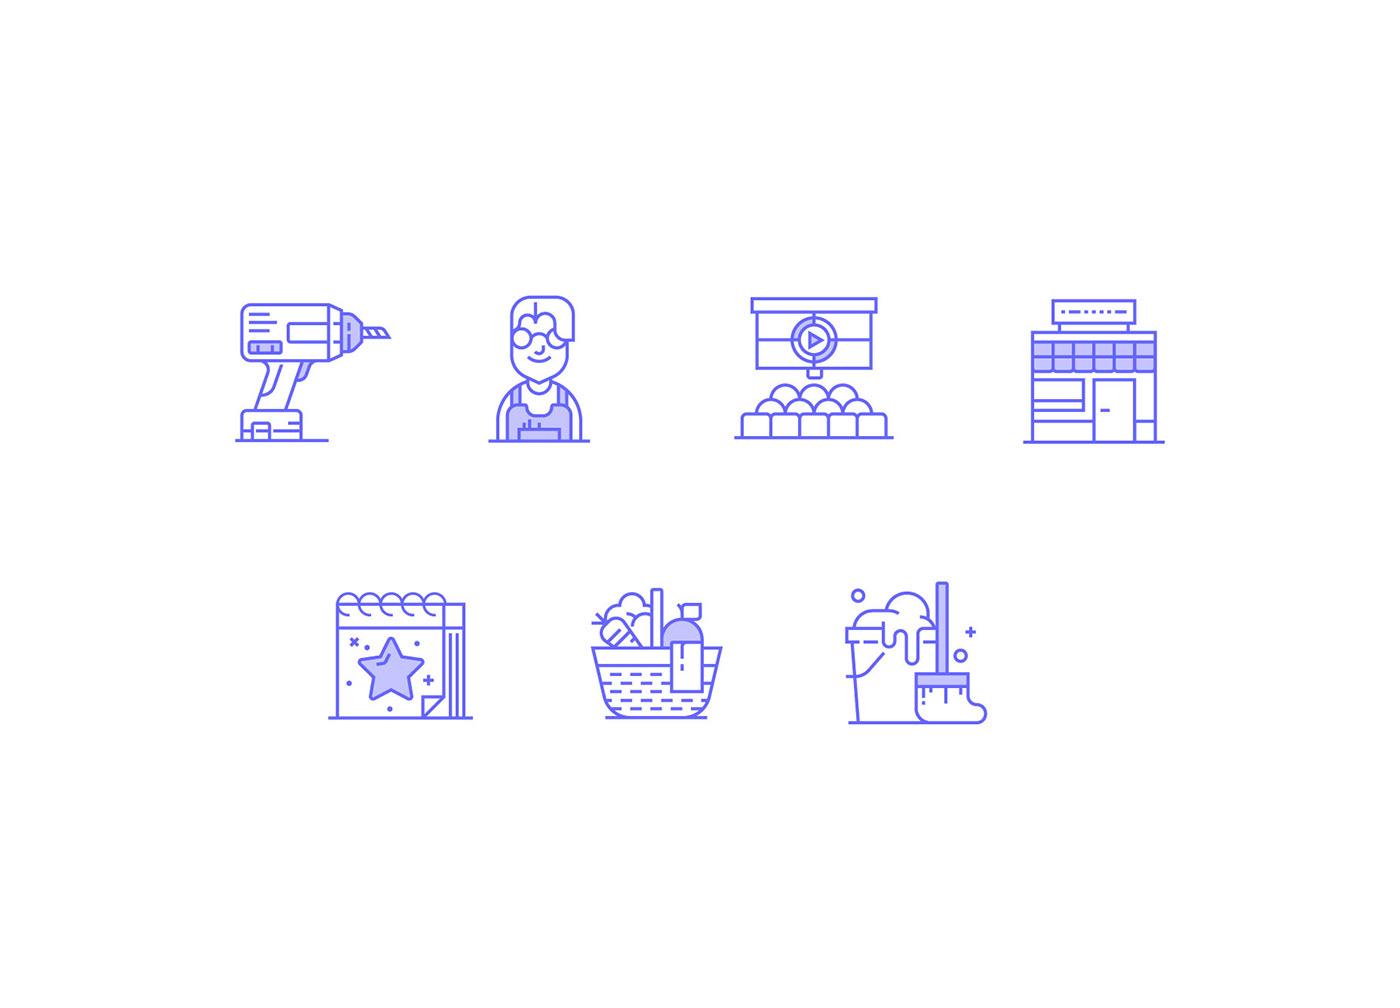 App brand app design app icons app illustration App Usability communities Intelligent Building motion graphics  neighborhood real estate